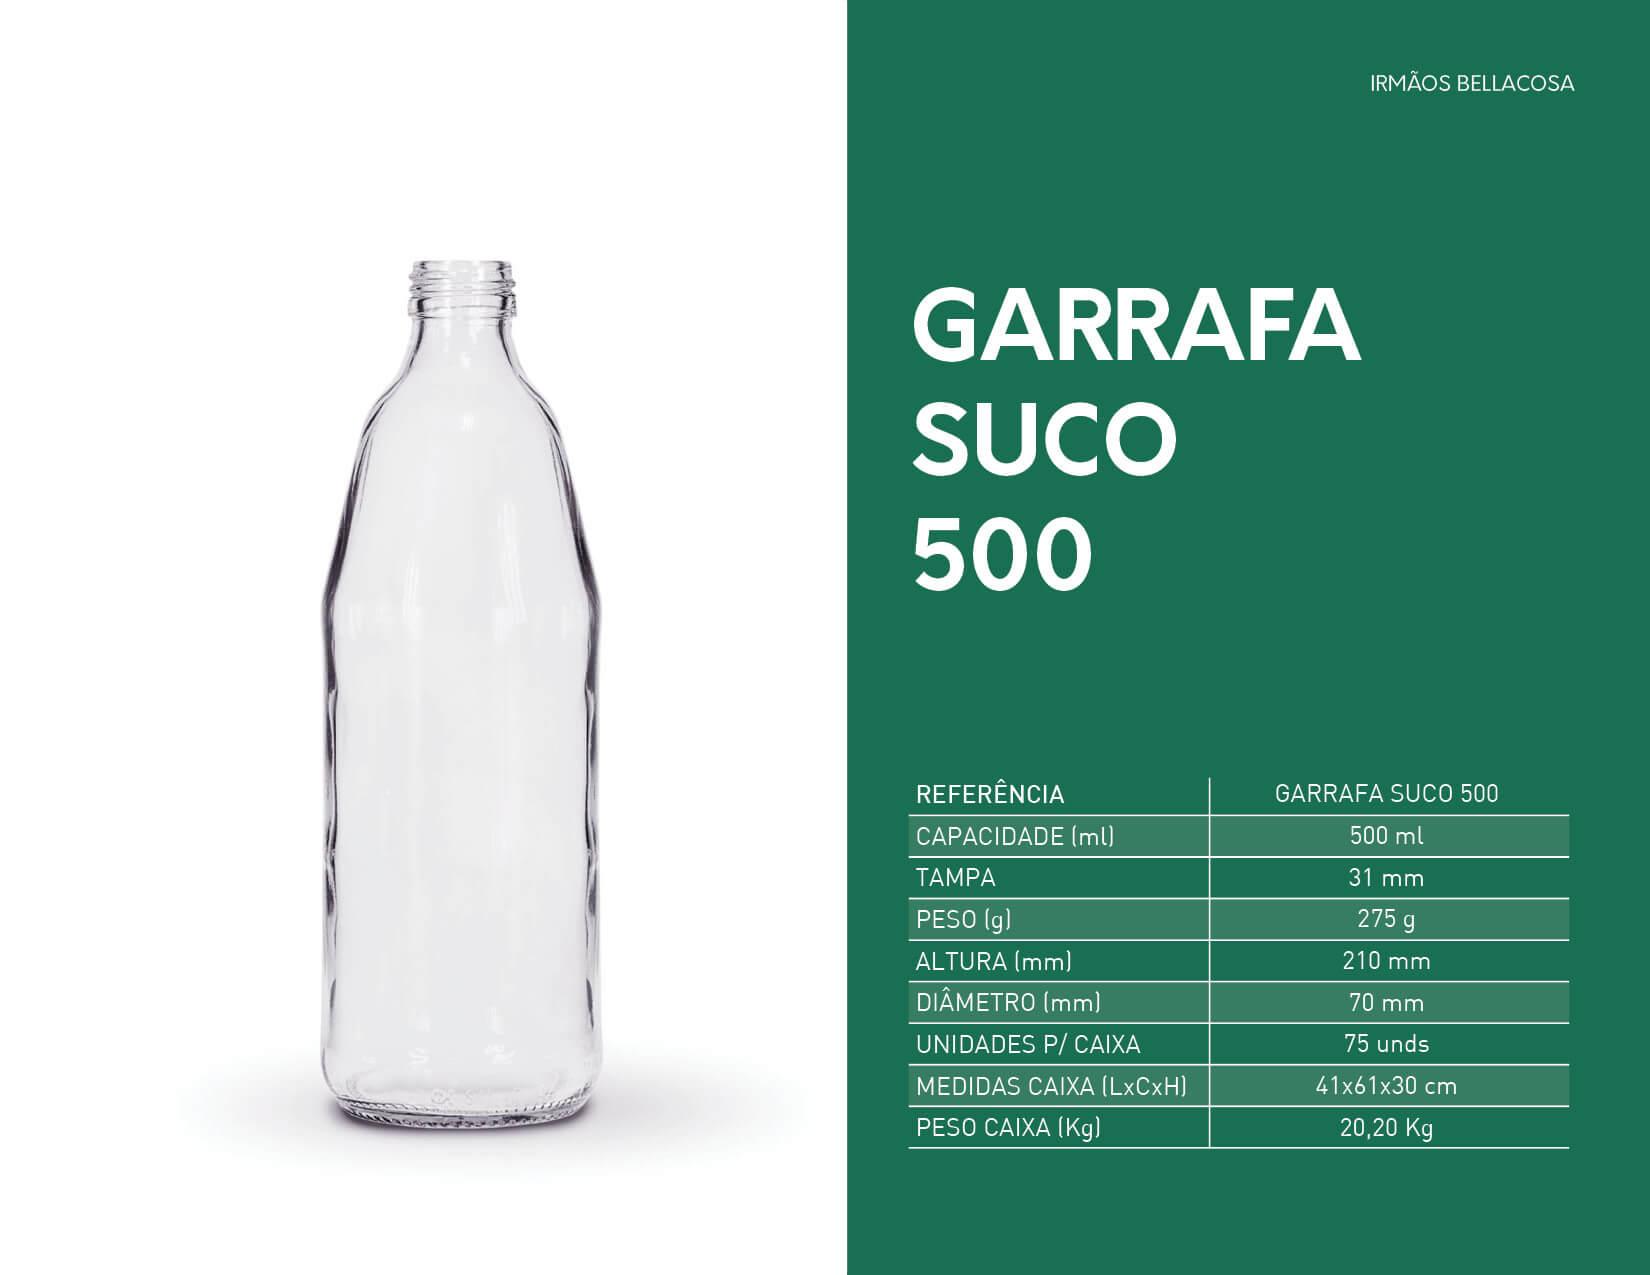 033-Garrafa-suco-500-irmaos-bellacosa-embalagens-de-vidro